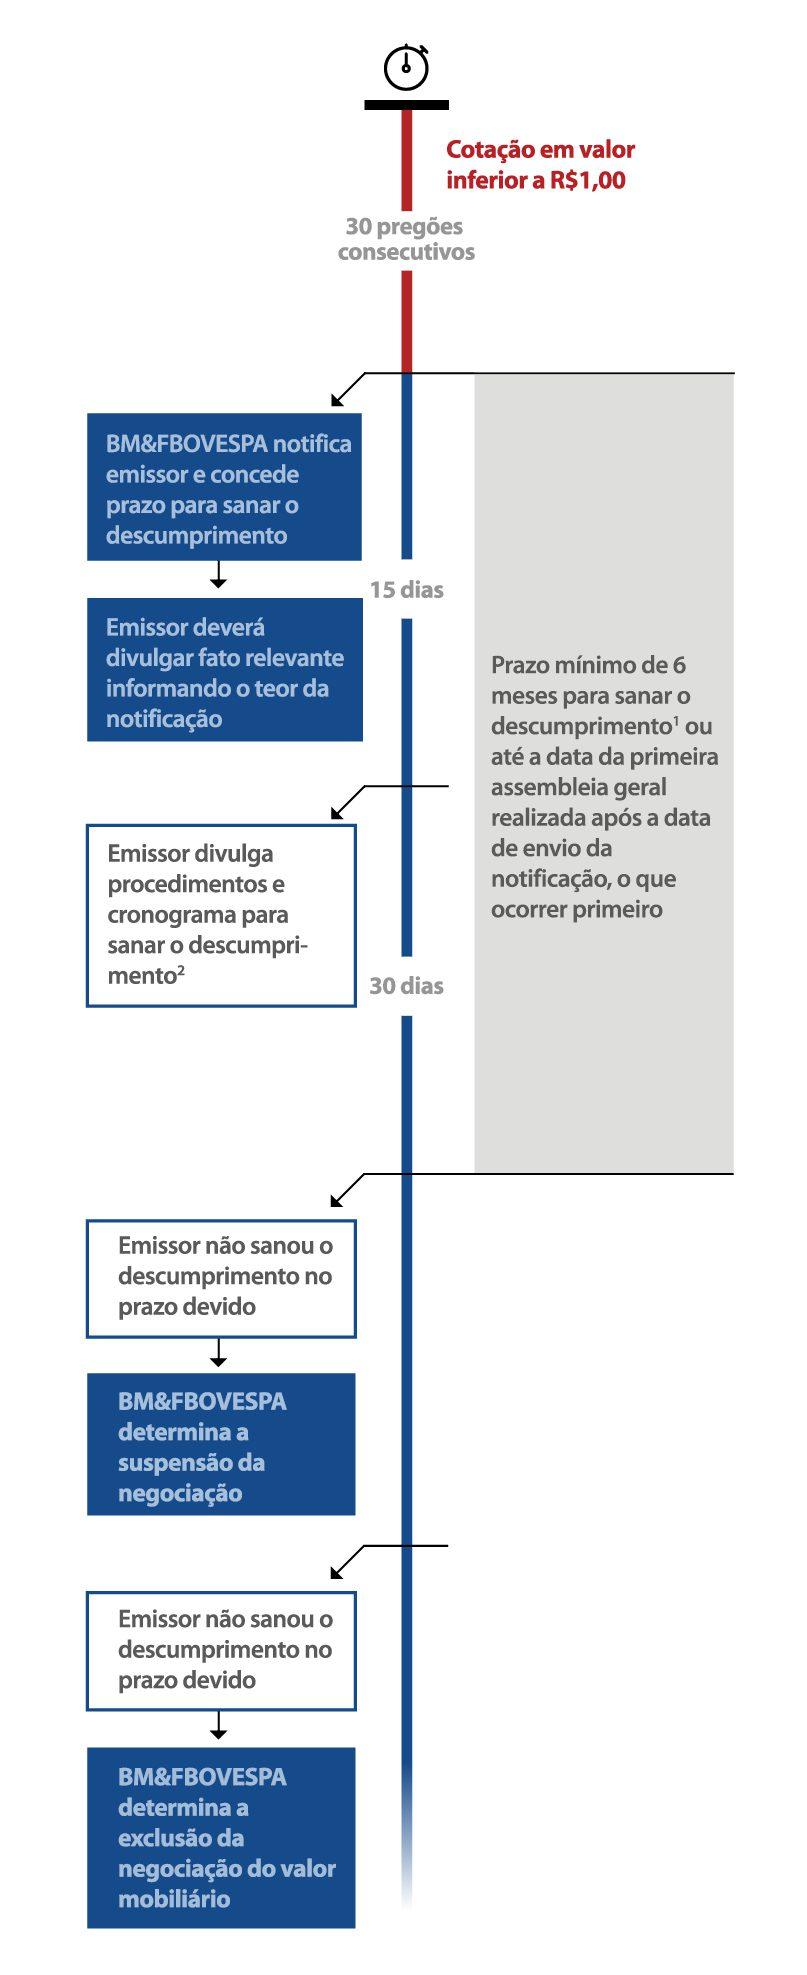 BMFBovespa(pag conteudo)_S1_Pt